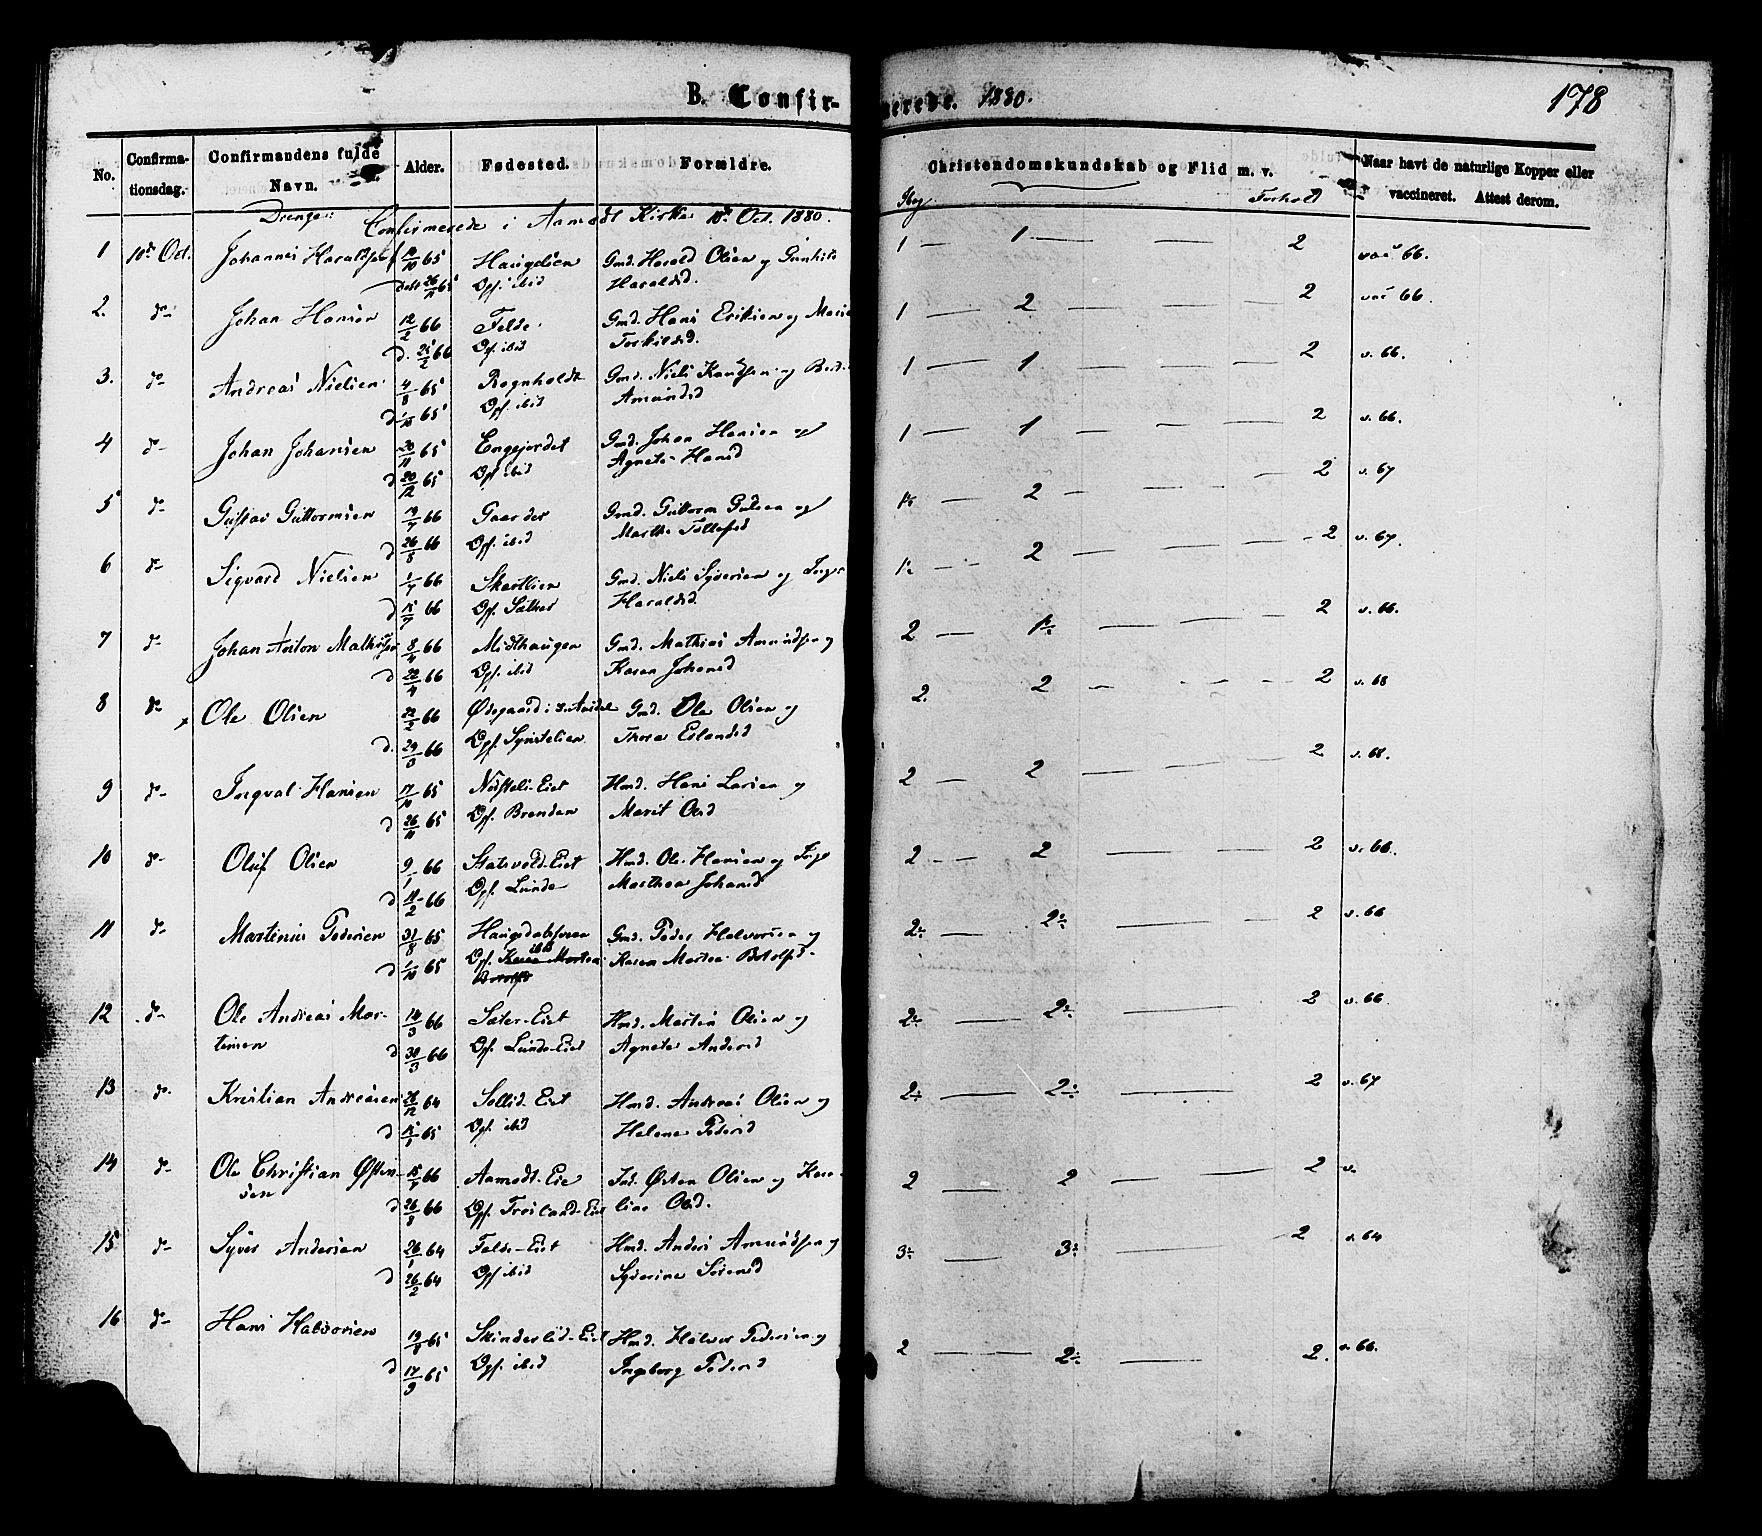 SAH, Nordre Land prestekontor, Ministerialbok nr. 2, 1872-1881, s. 178